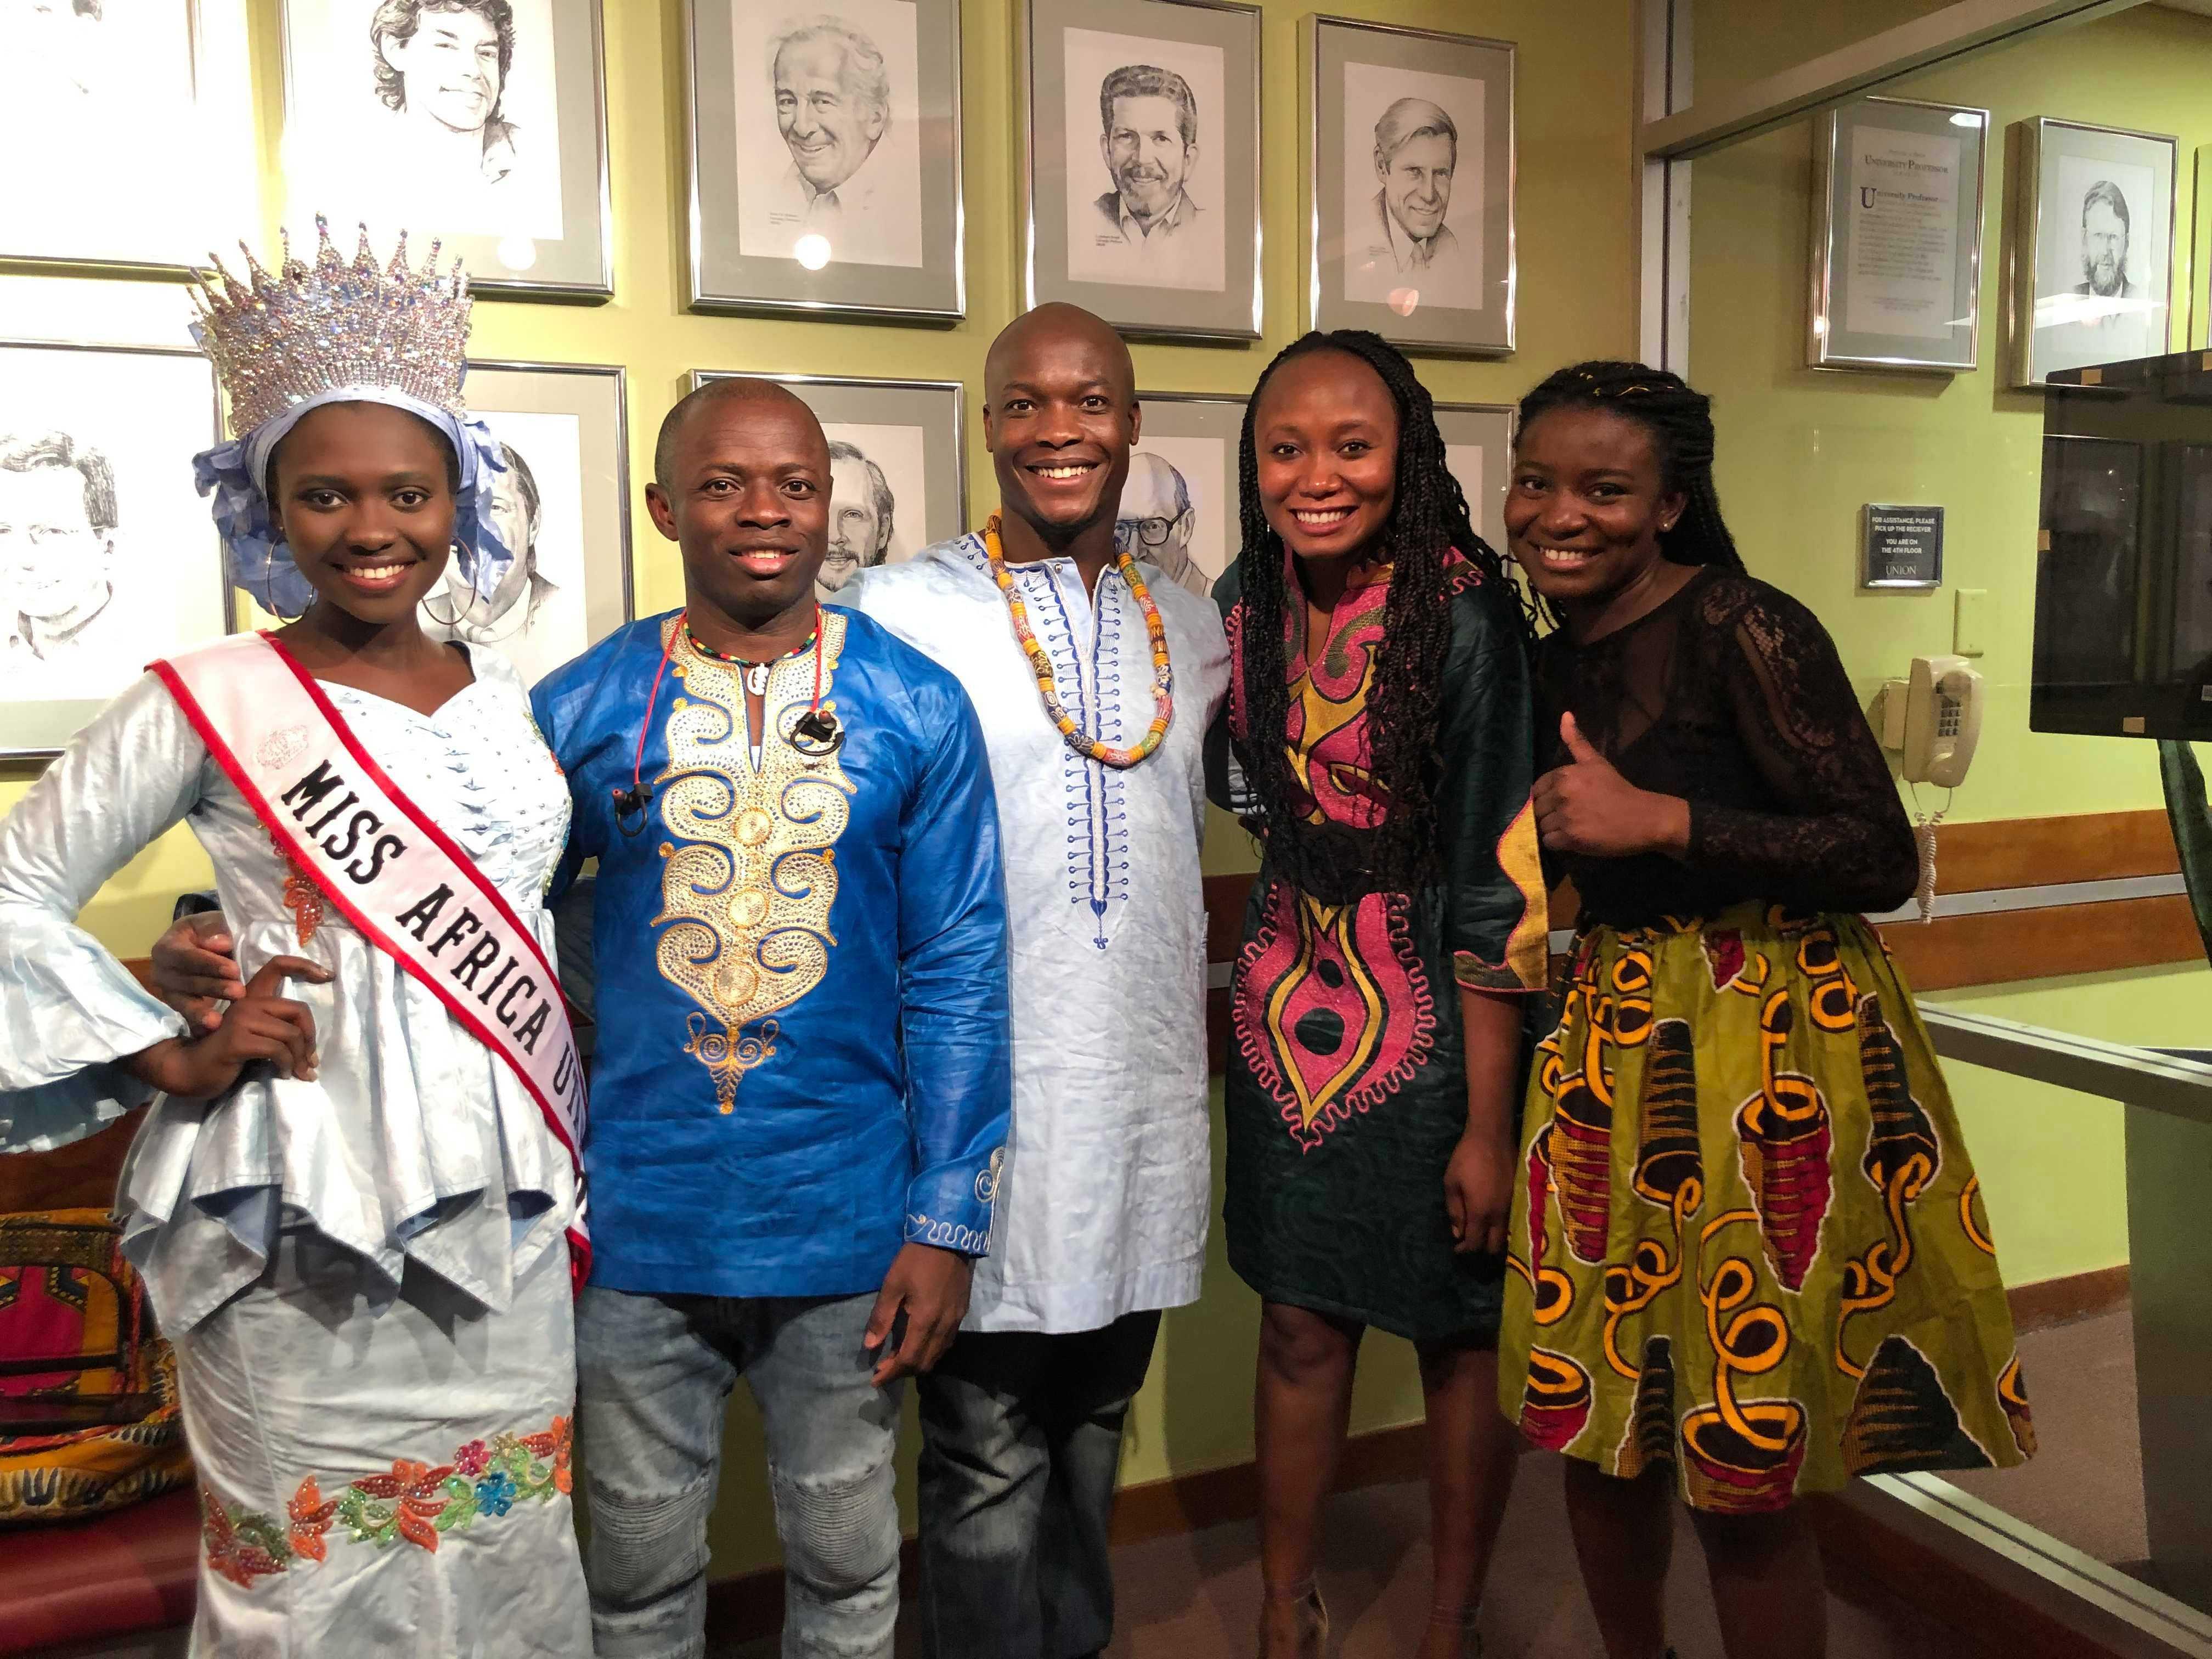 From left to right: Fatoumata Barrow, Maxwell Ayeliya, Christian Appiah-Knudsen, Madelaine Lamah, Naomi Baende at ASA African Night on Saturday, April 13, 2019 (Courtesy of Madelaine Lamah)